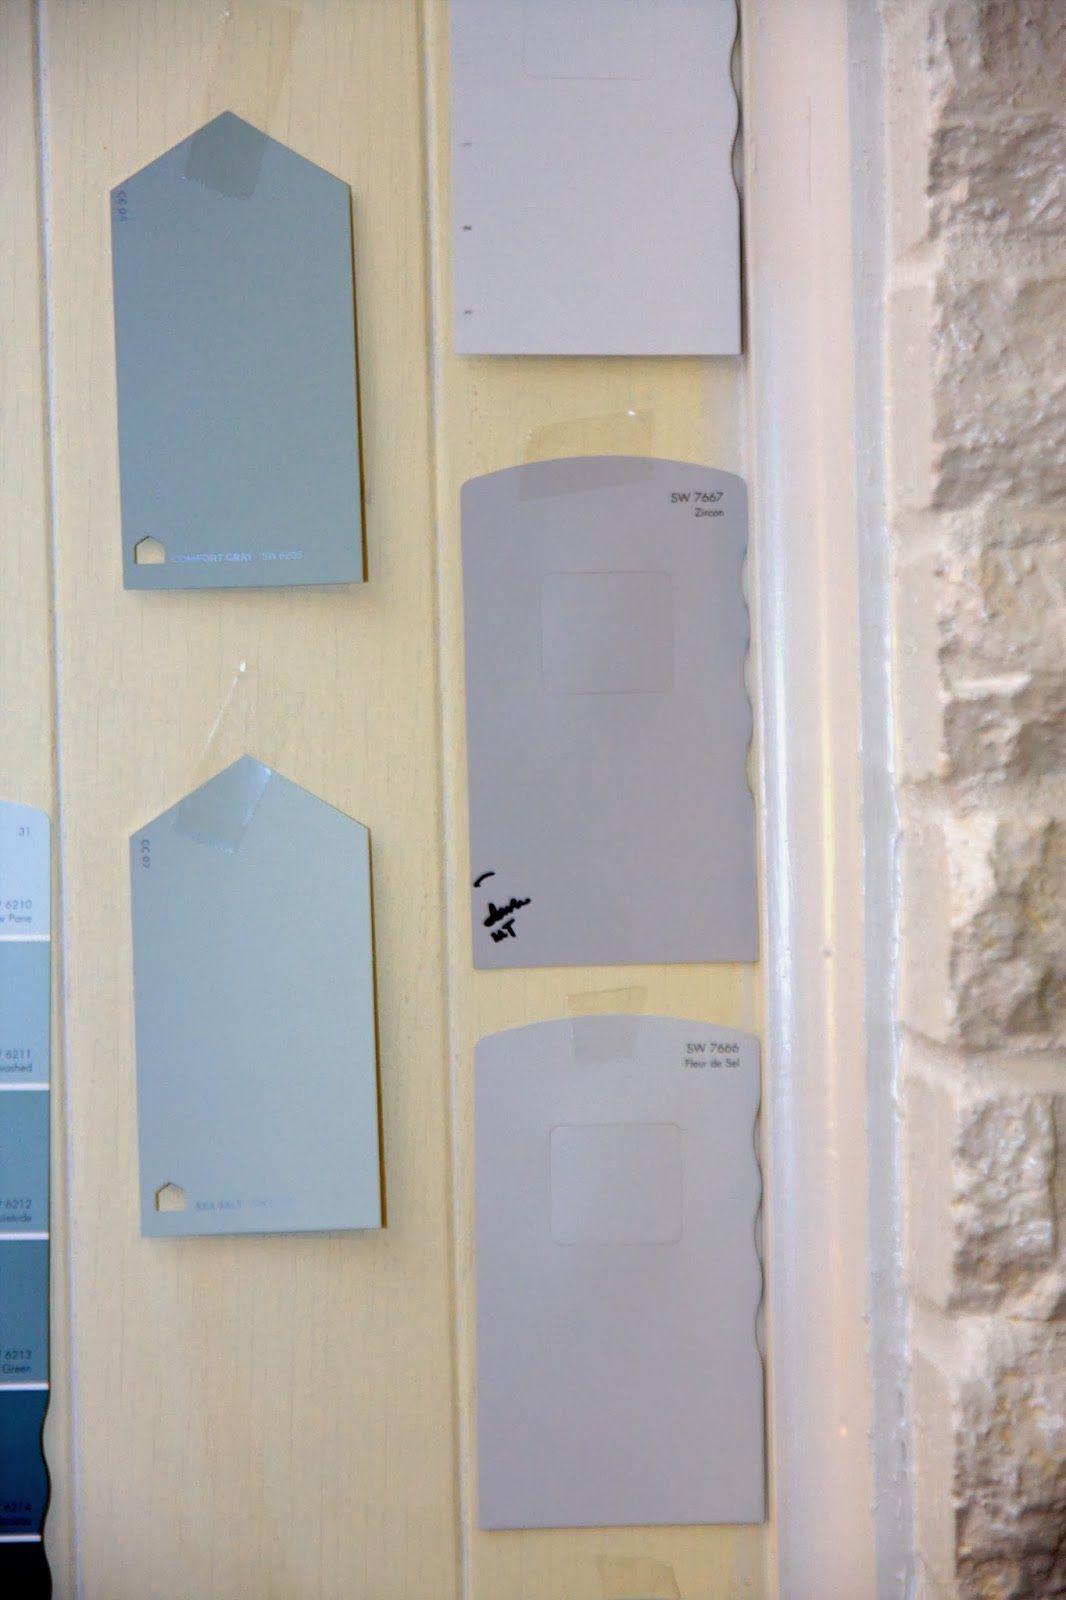 Choosing gray wall paint colors Sherwin Williams Zircon, Knitting Needles, Big Chill, Sea Salt, Comfort Gray